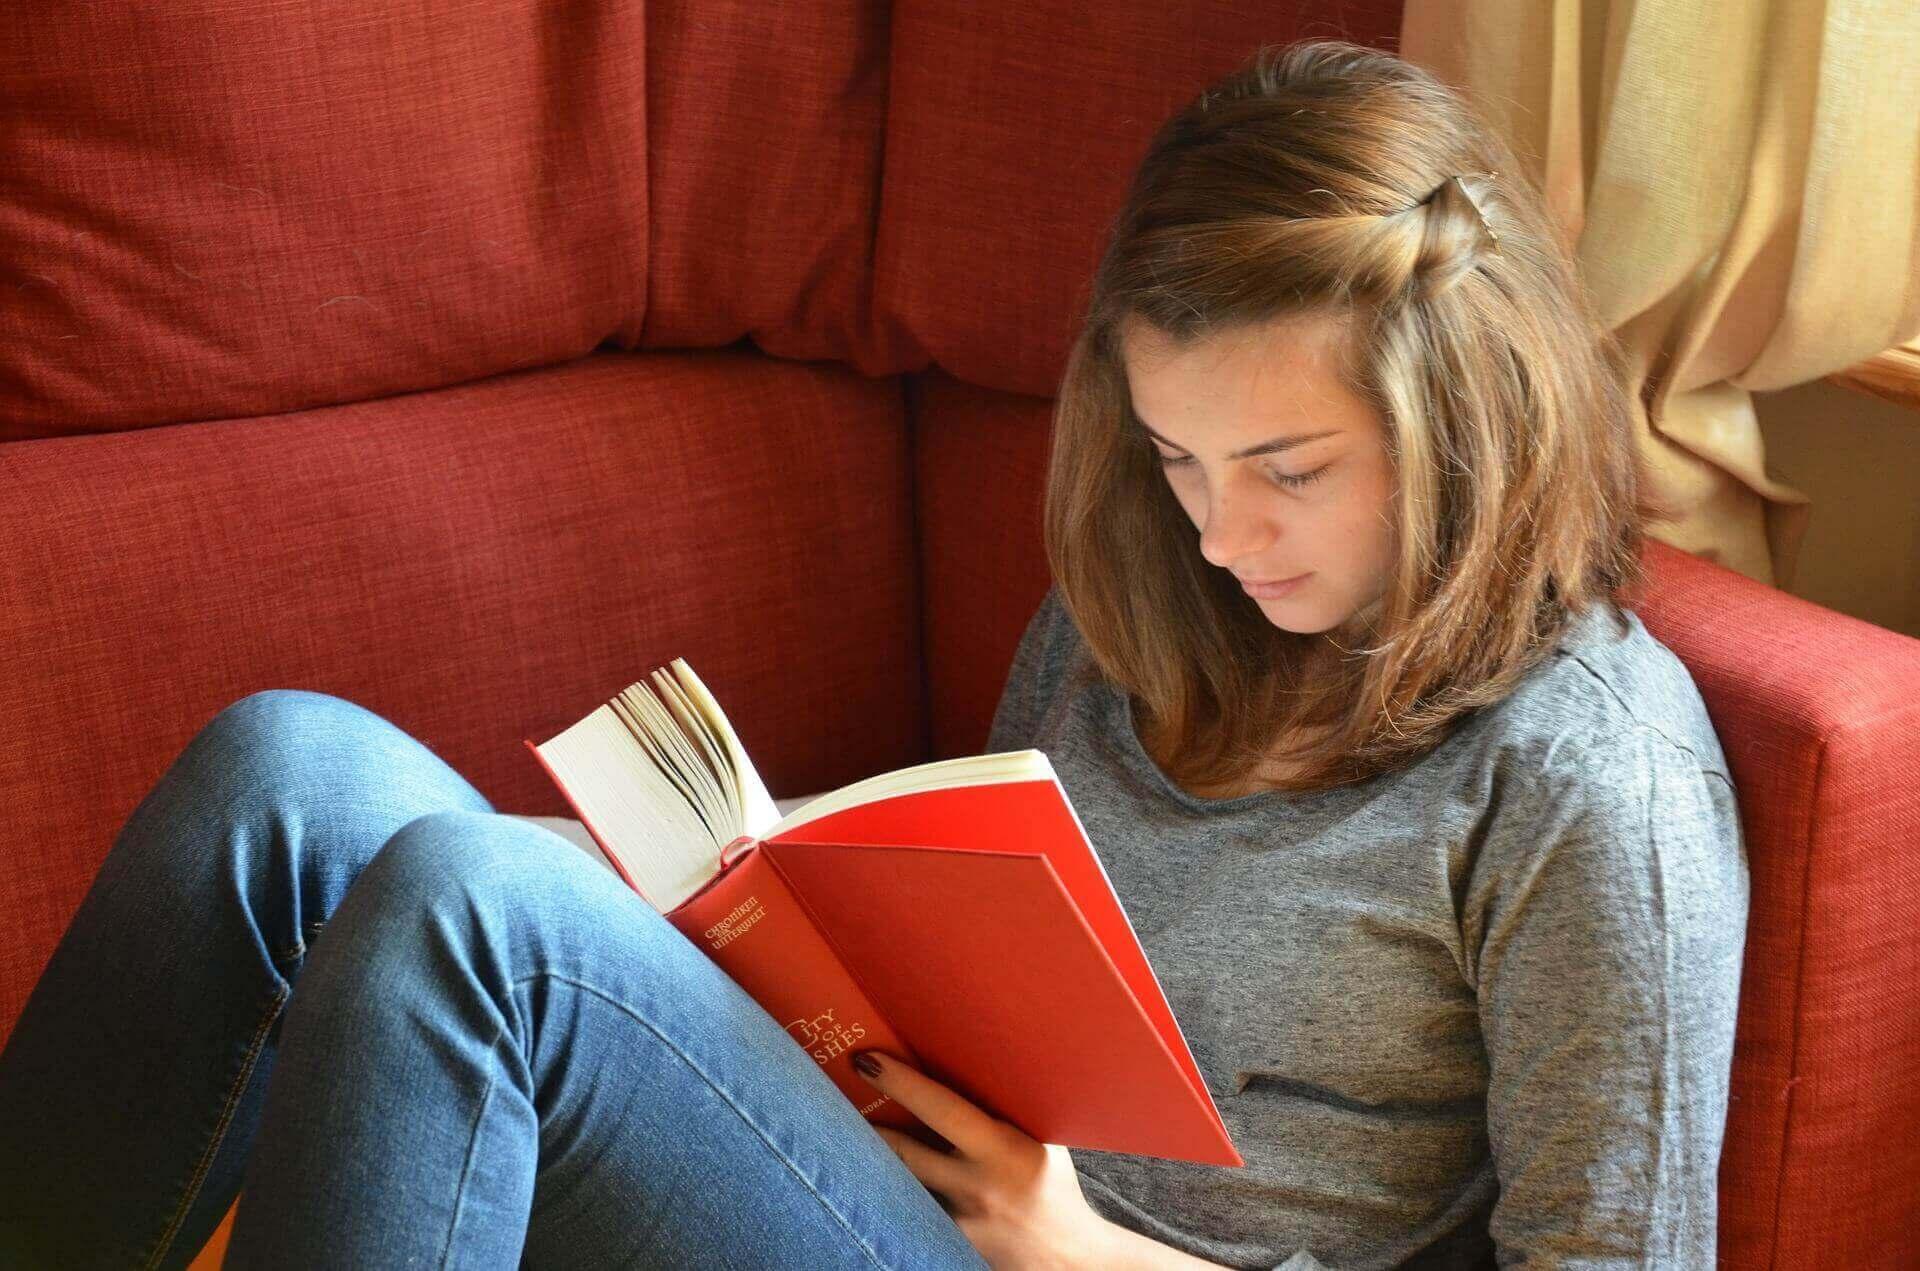 Looking Beyond Education When Hiring